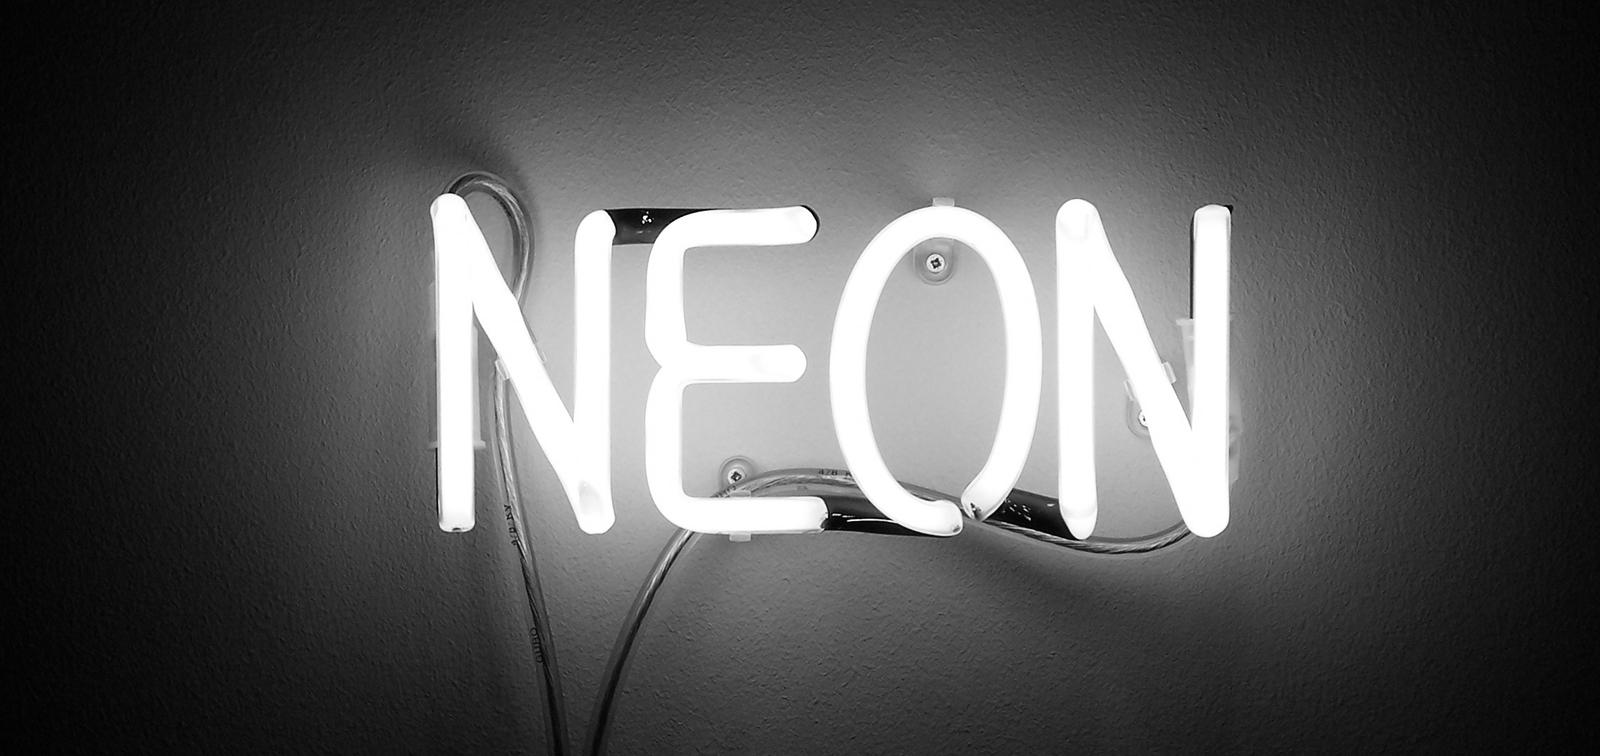 Super Home - Luminart Neon SN56